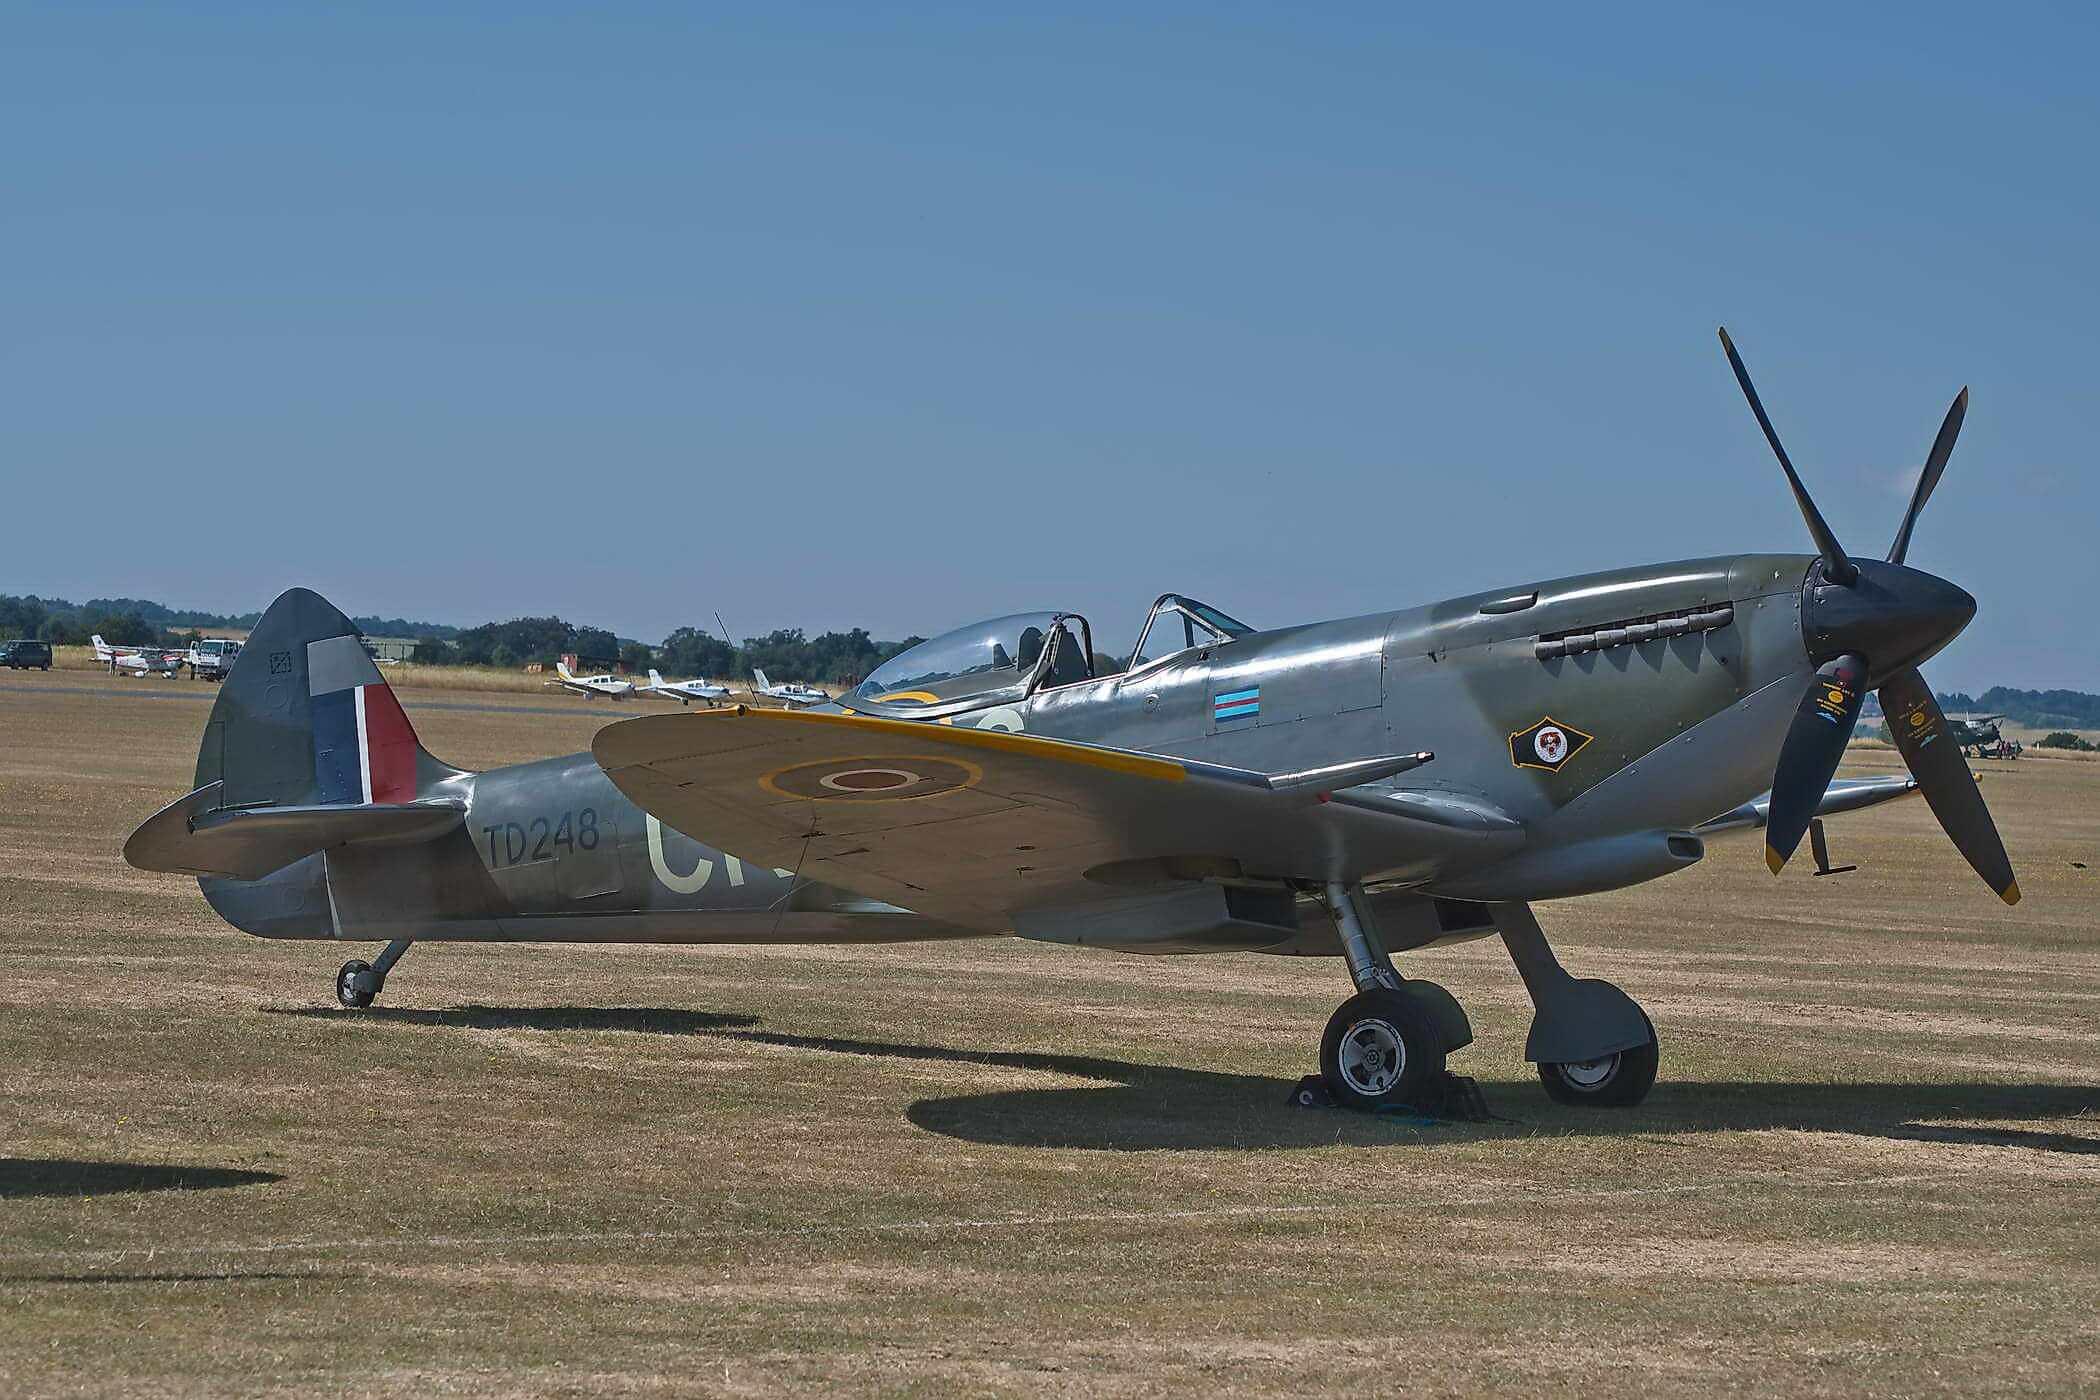 Spitfire LF XVI TD248